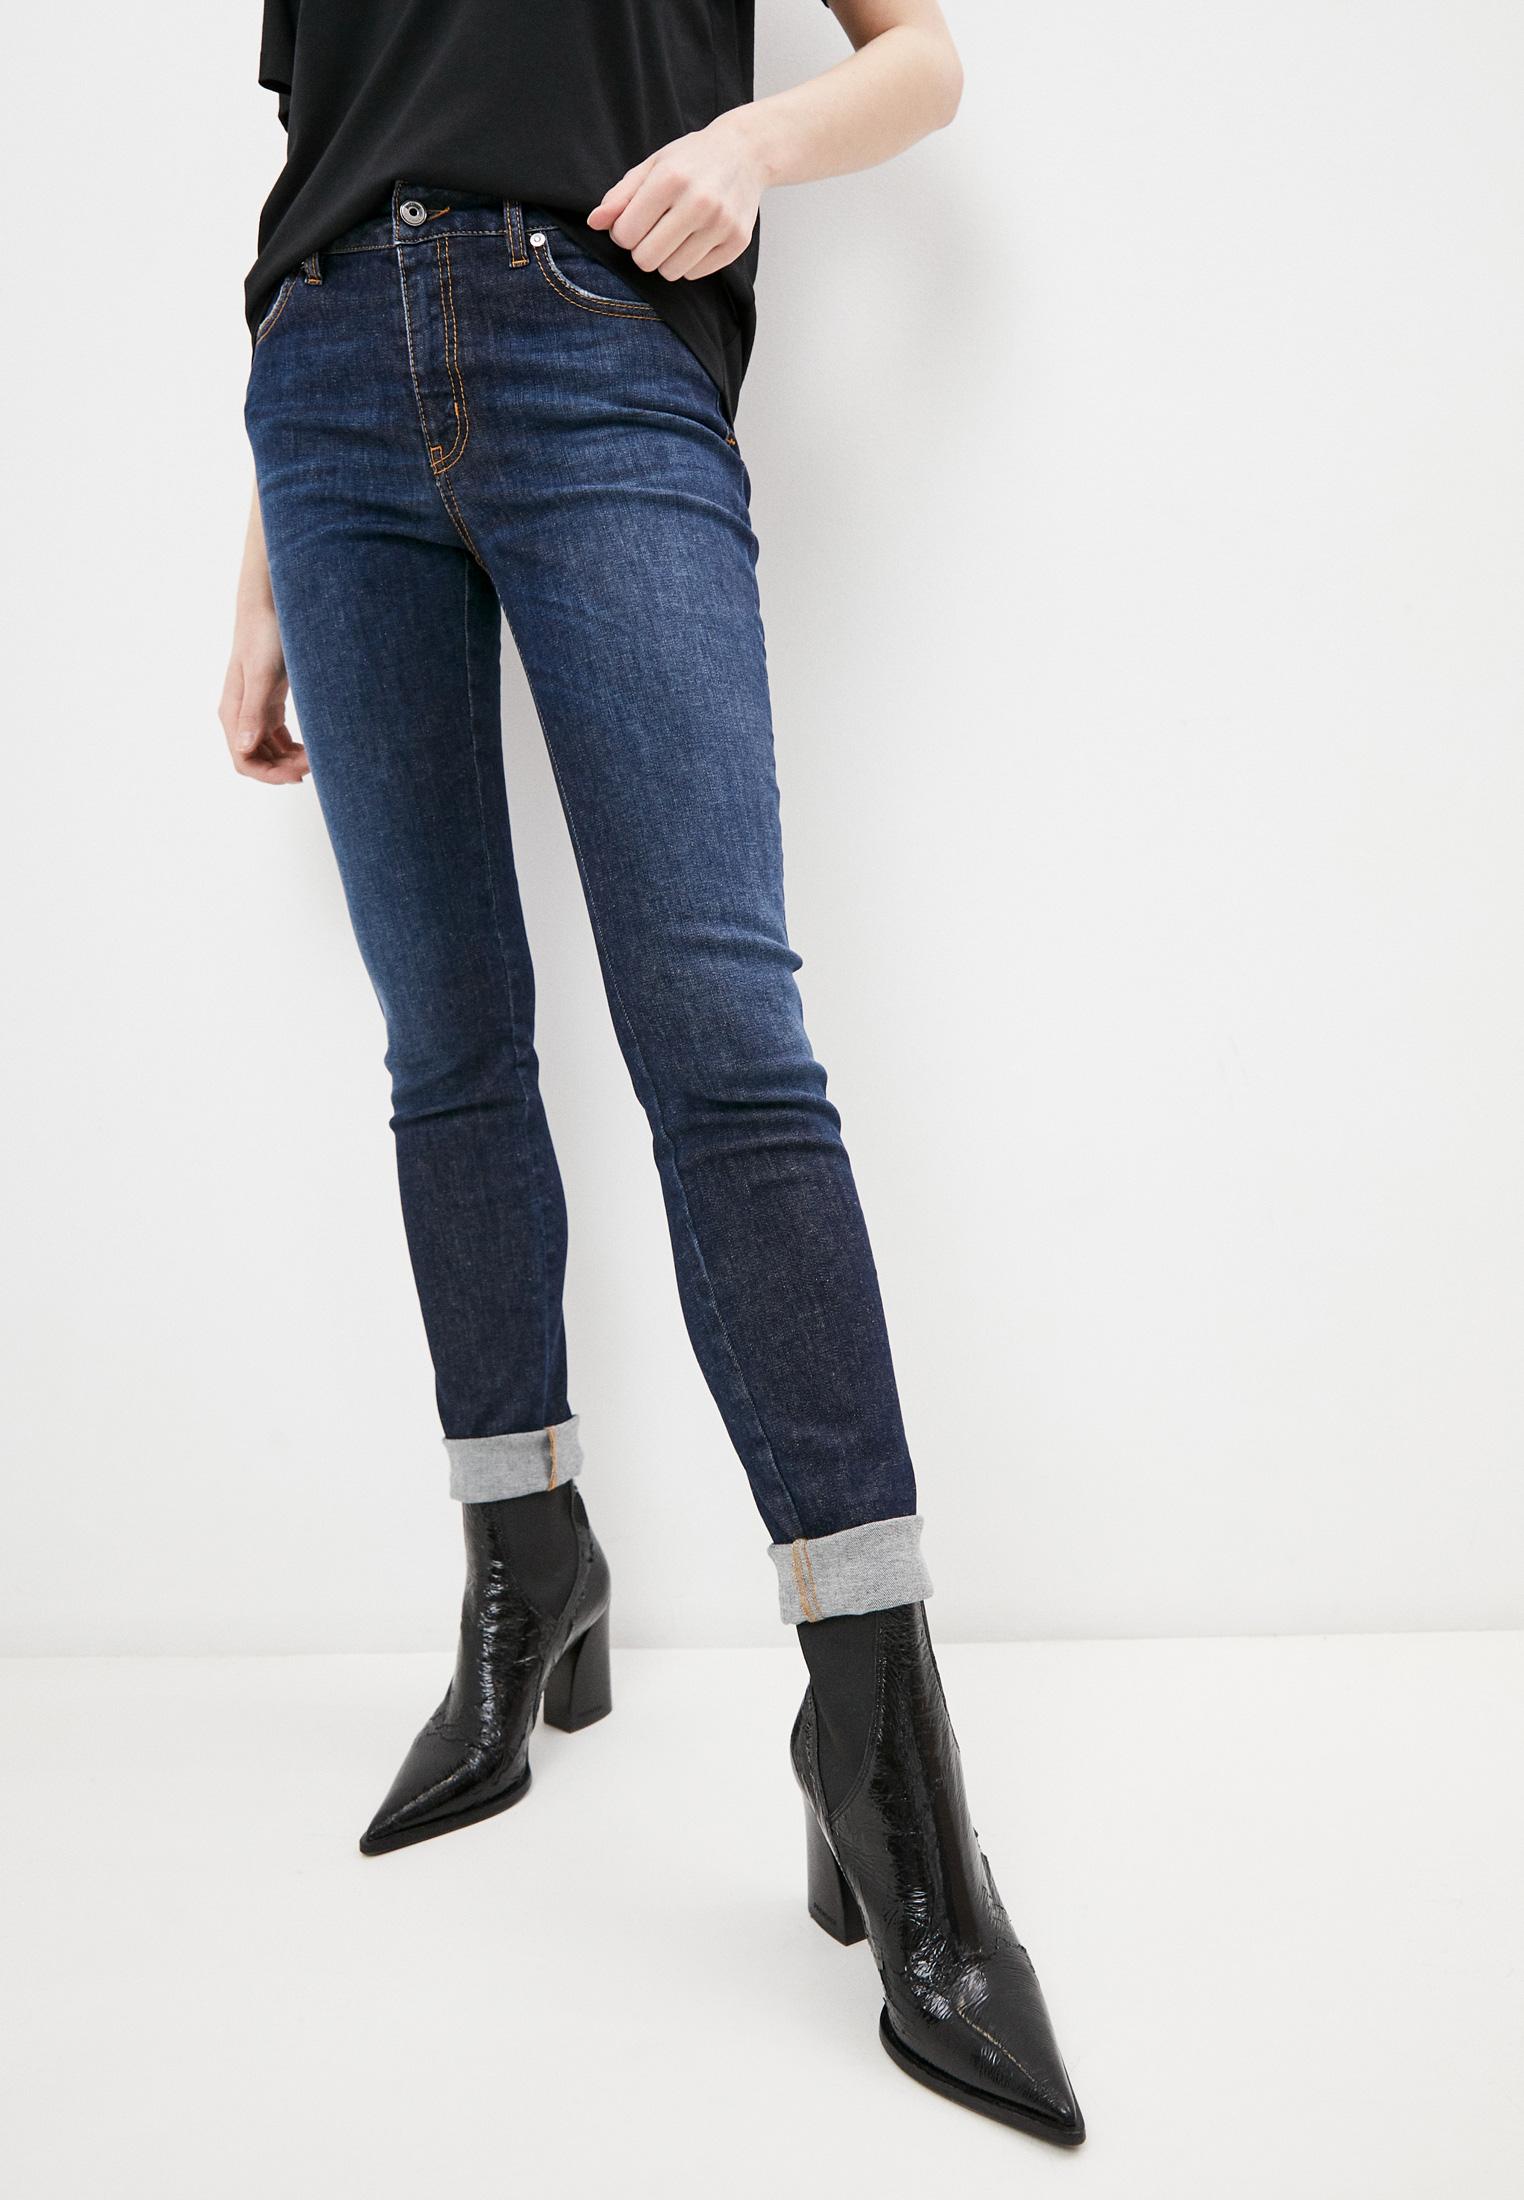 Зауженные джинсы Just Cavalli (Джаст Кавалли) S02LA0231N31885